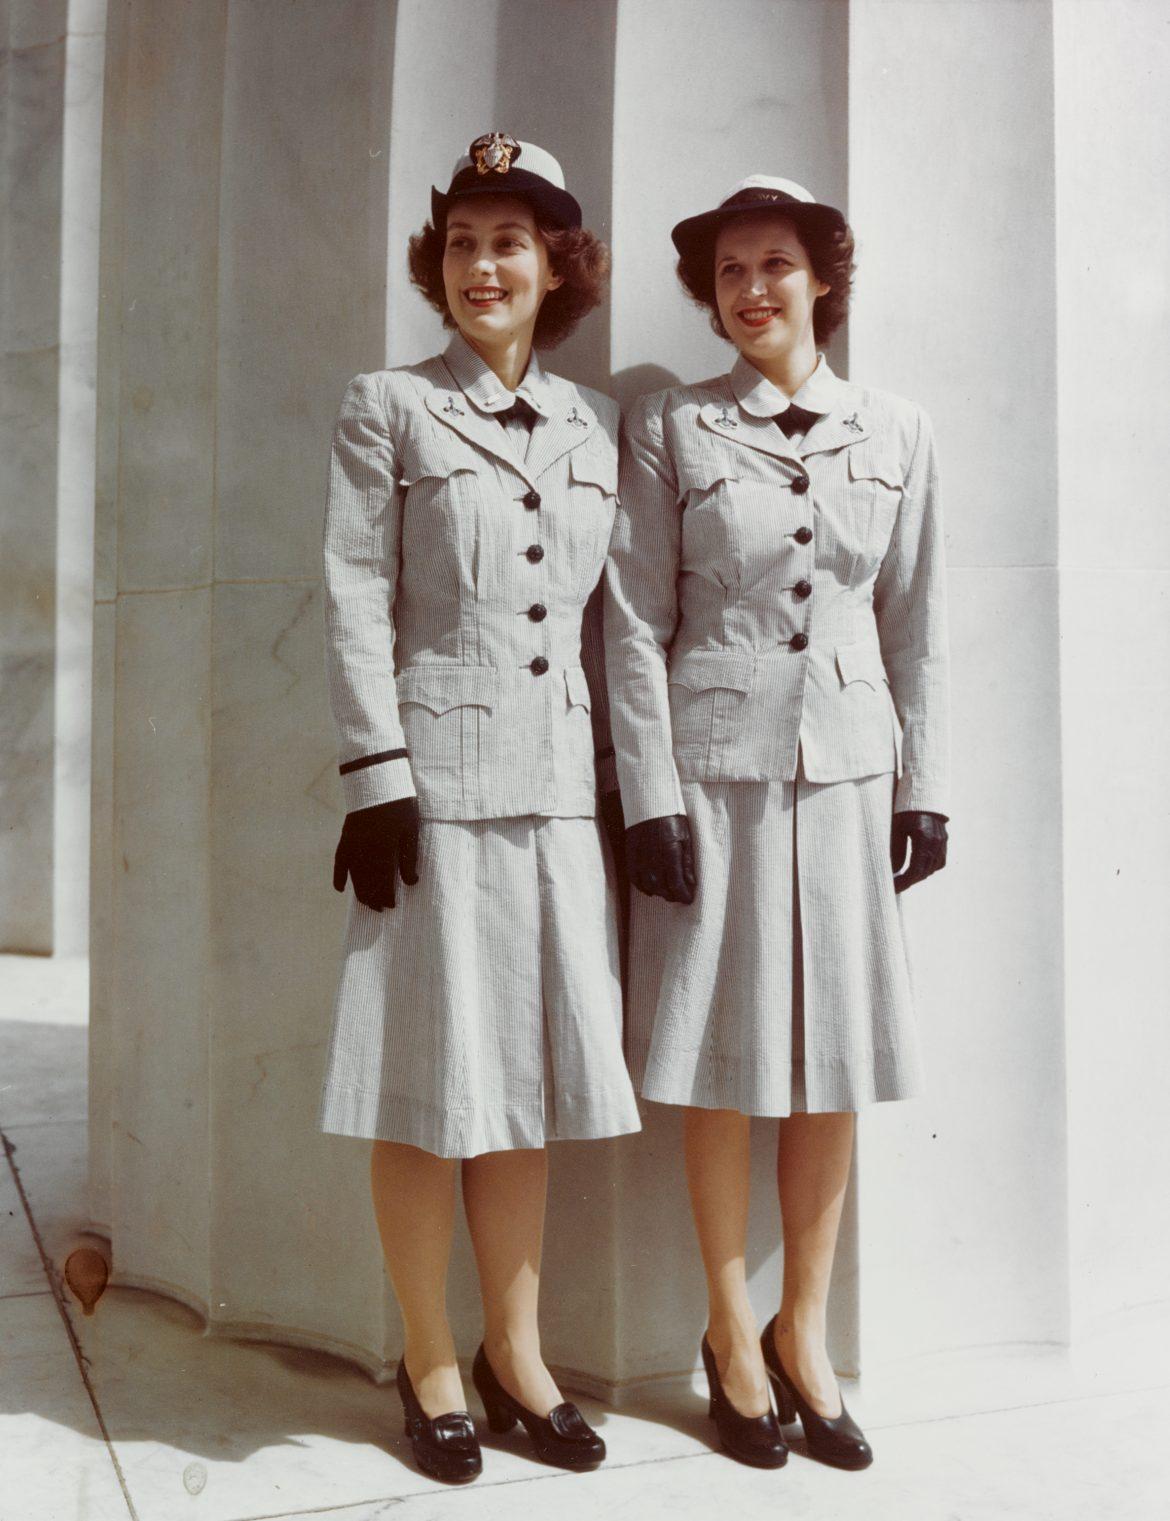 WAVES Model Gray Summer Working Uniforms